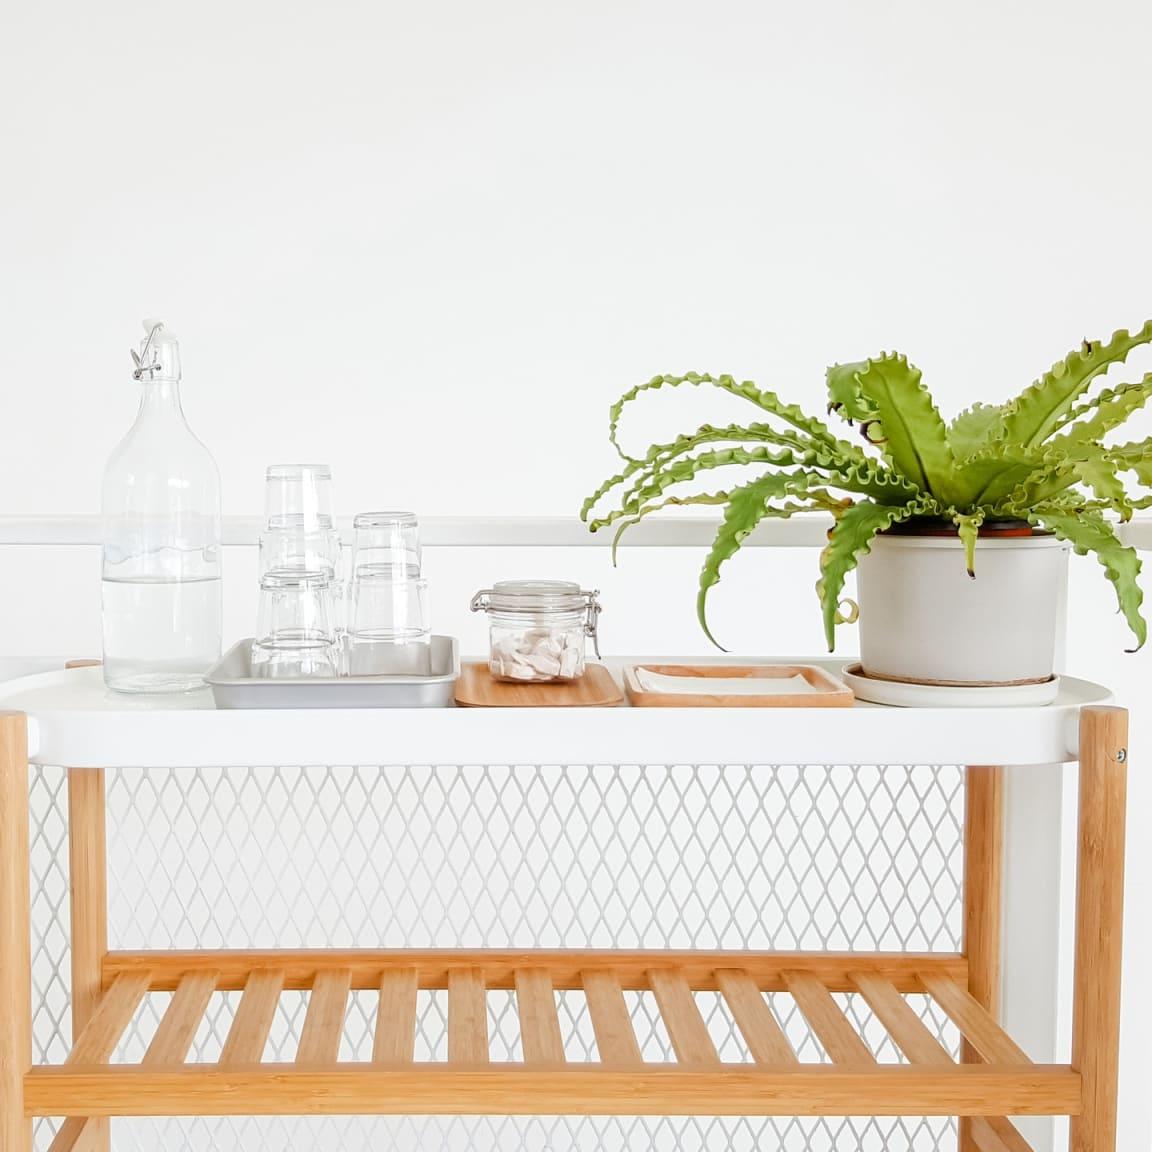 Achieve a Mega Home Clean in 3 Easy Steps